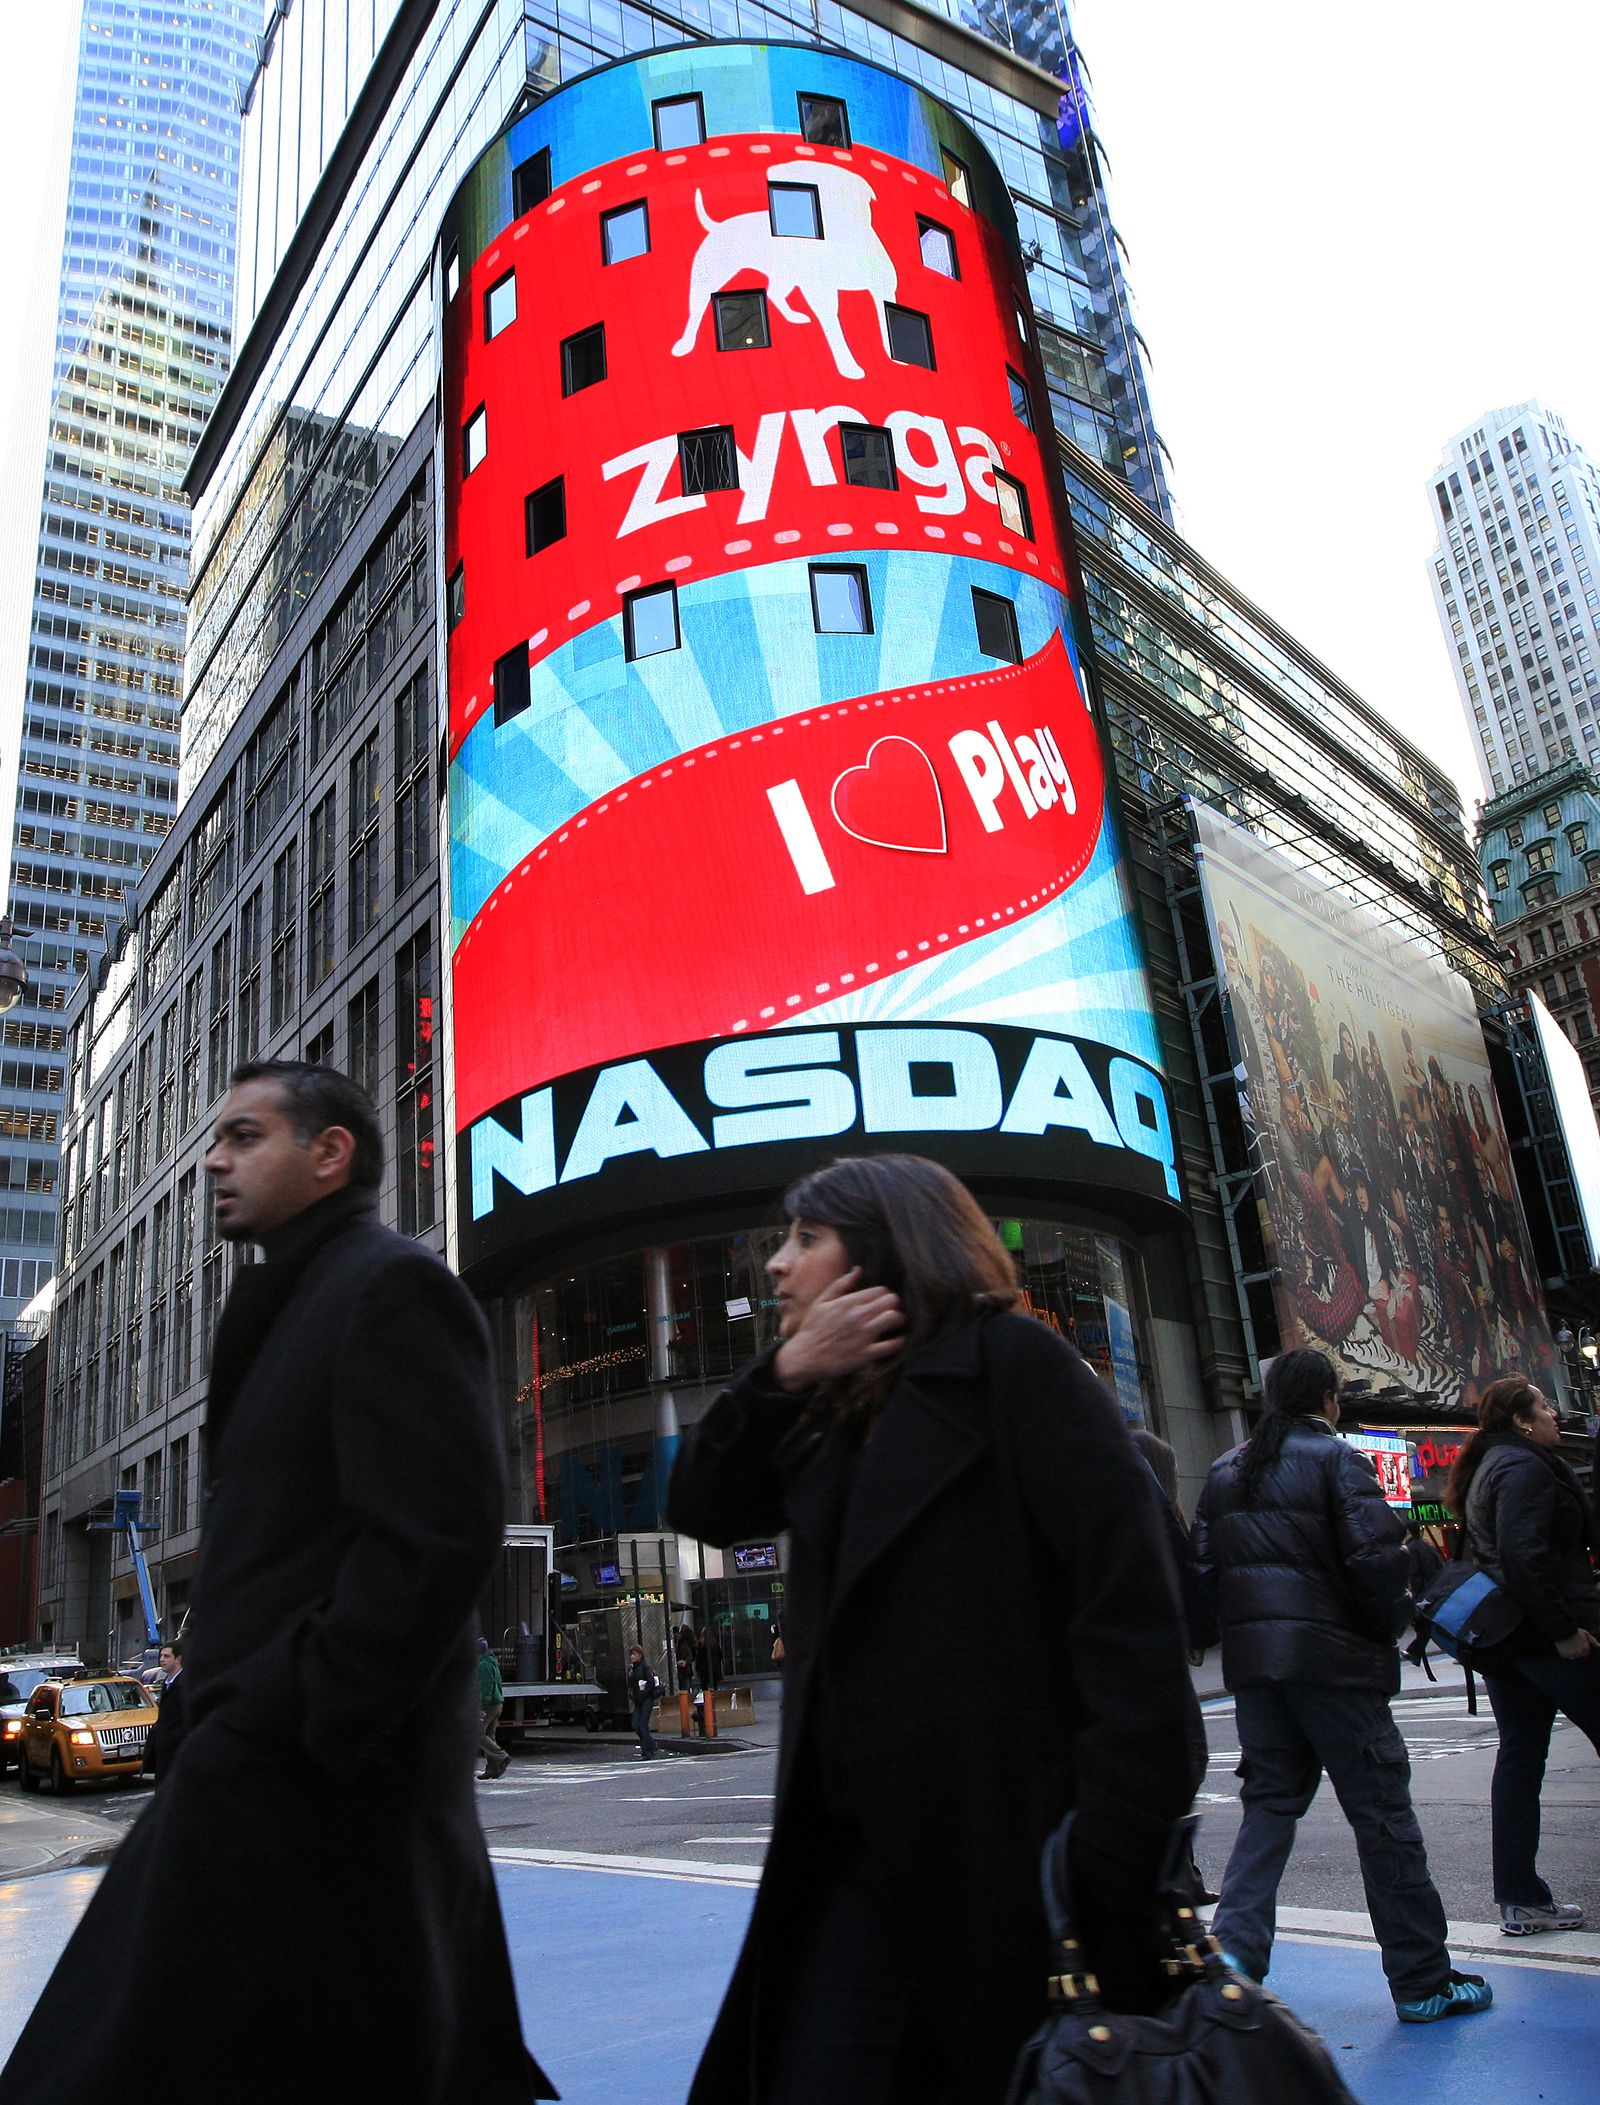 Zynga / Nasdaq / NY Times Square